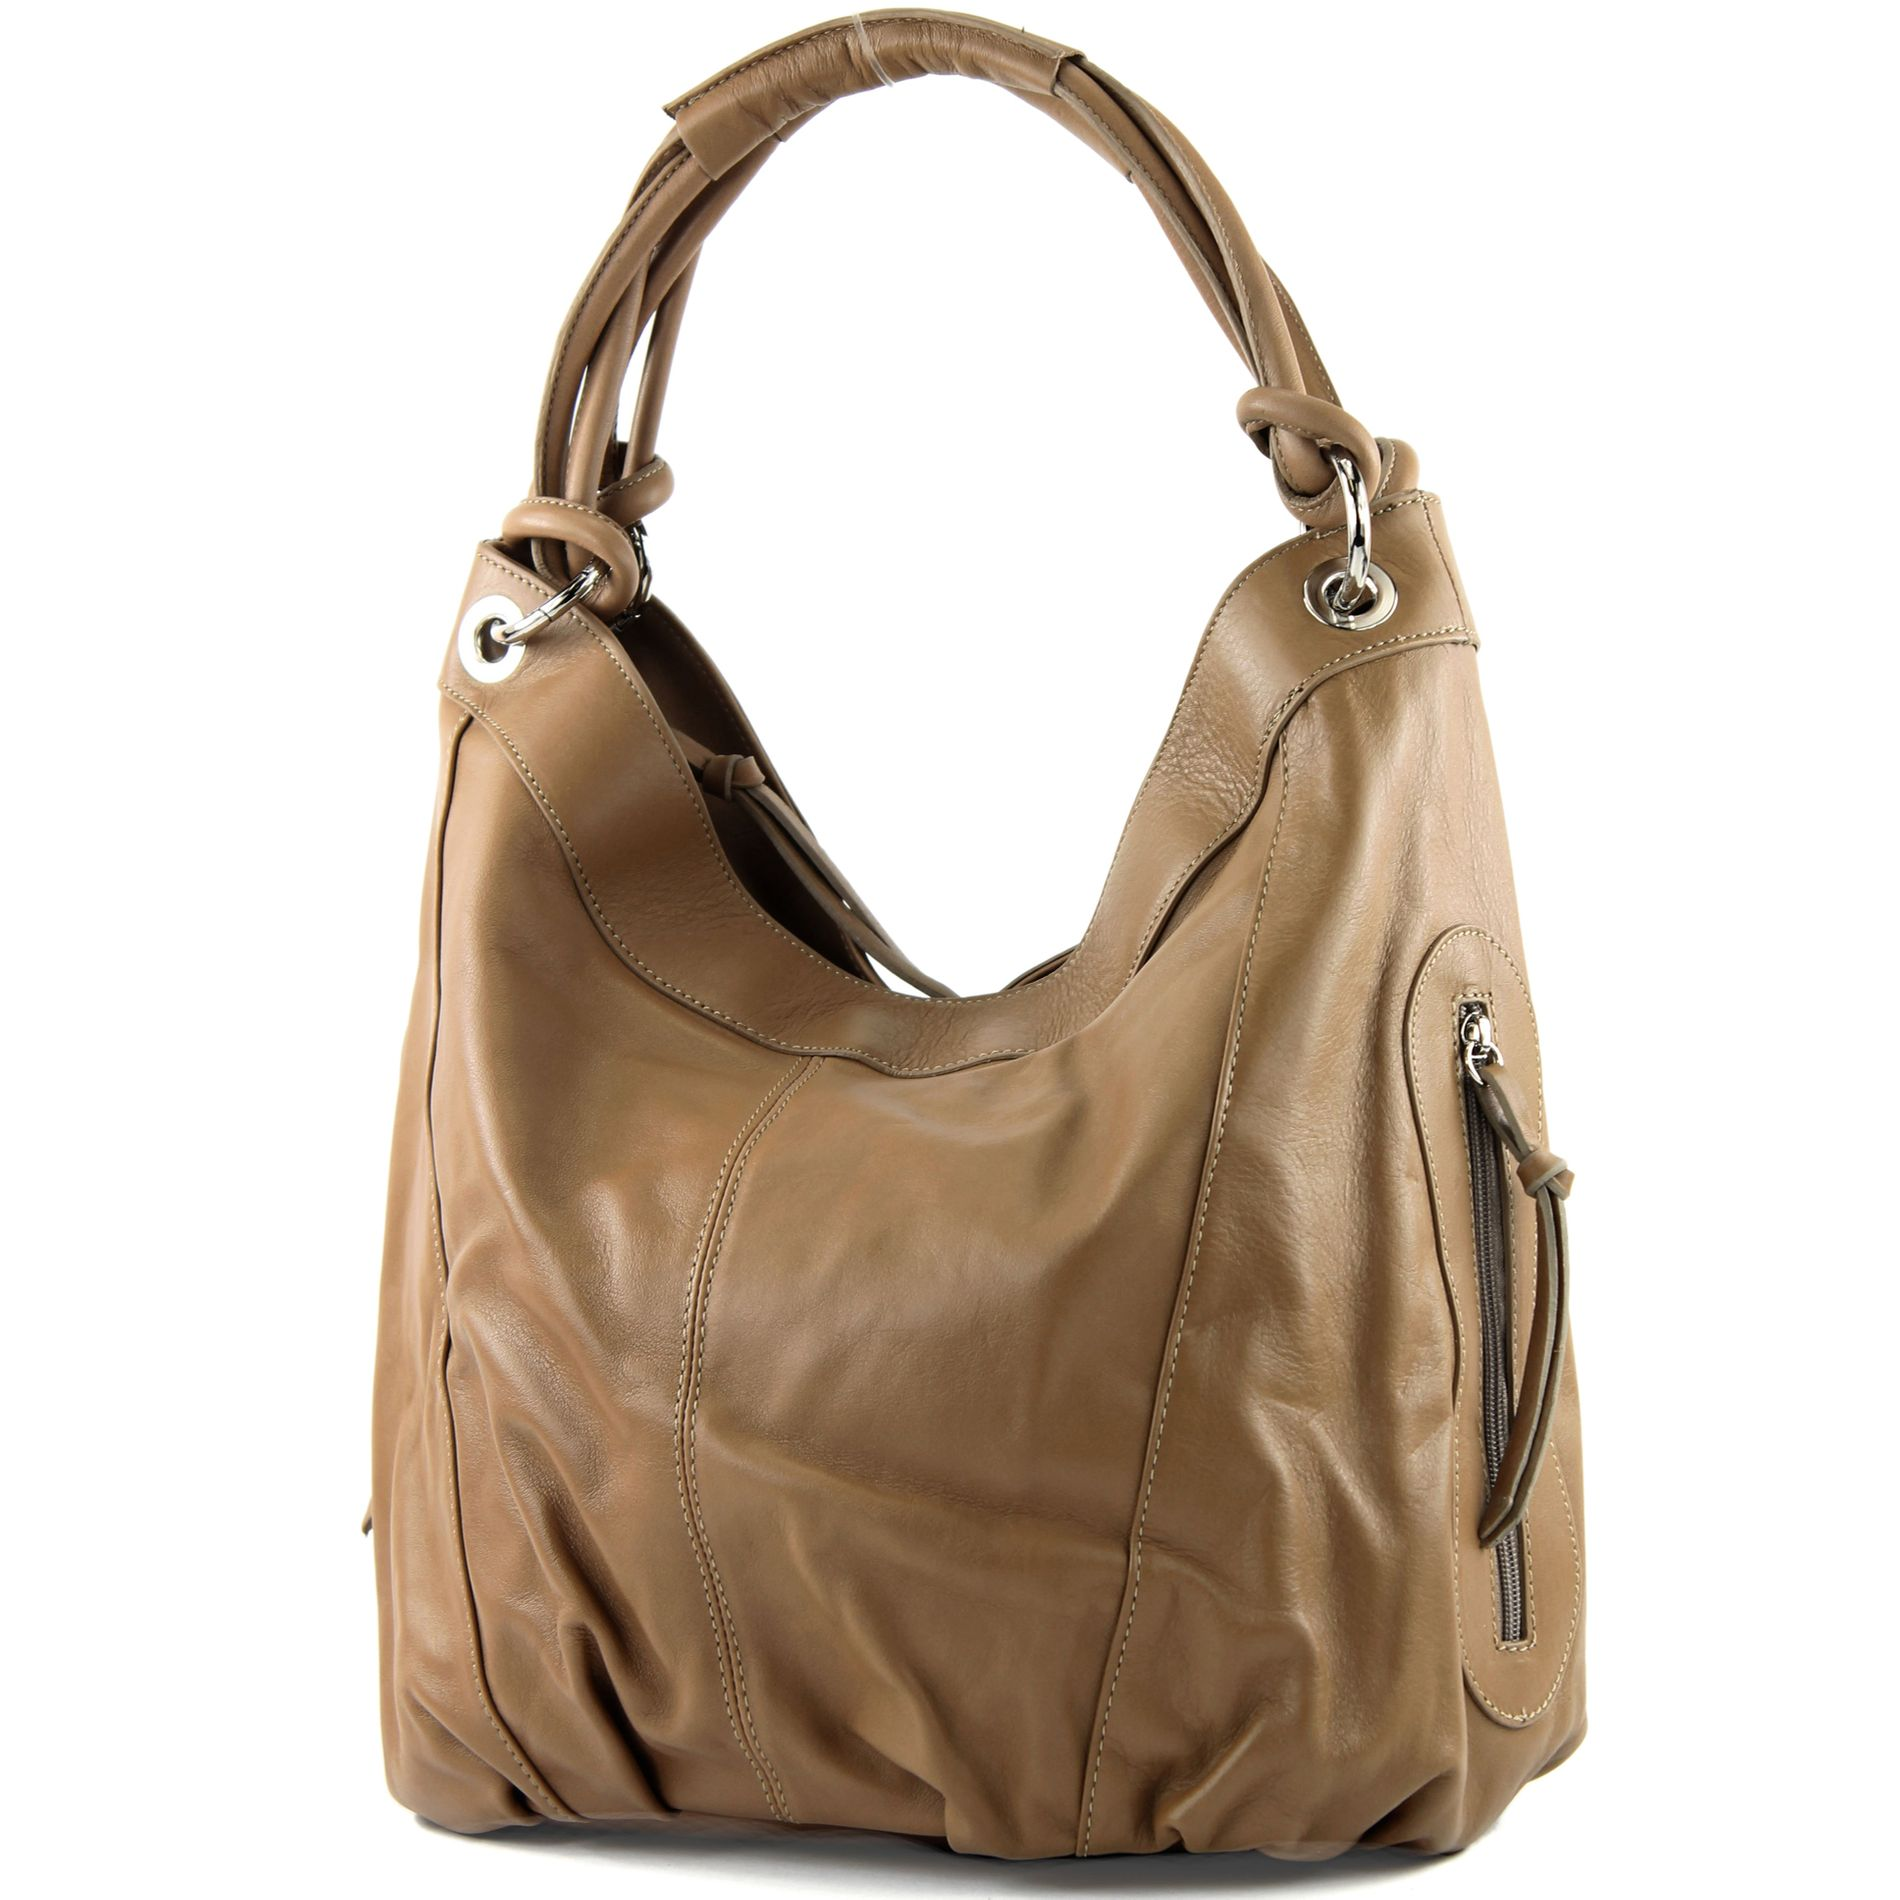 modamoda de - ital. Ledertasche Damenhandtasche Schultertasche Leder + Nappaleder Z18, Präzise Farbe:Dunkelblau Leder modamoda de - Made in Italy